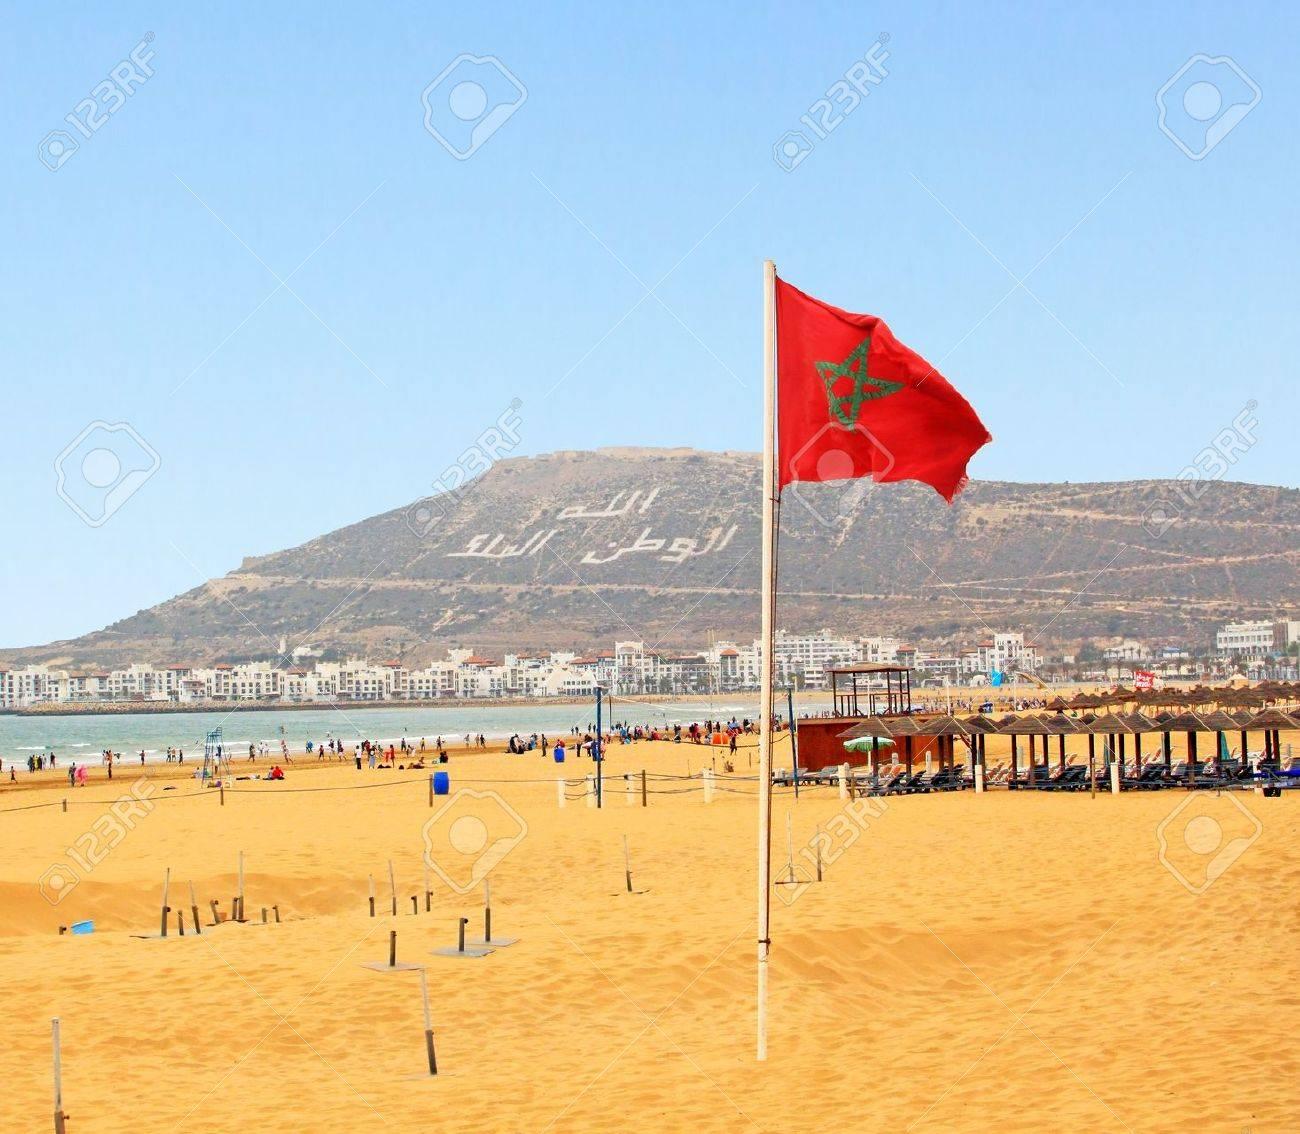 Bilderesultat for marokko strand